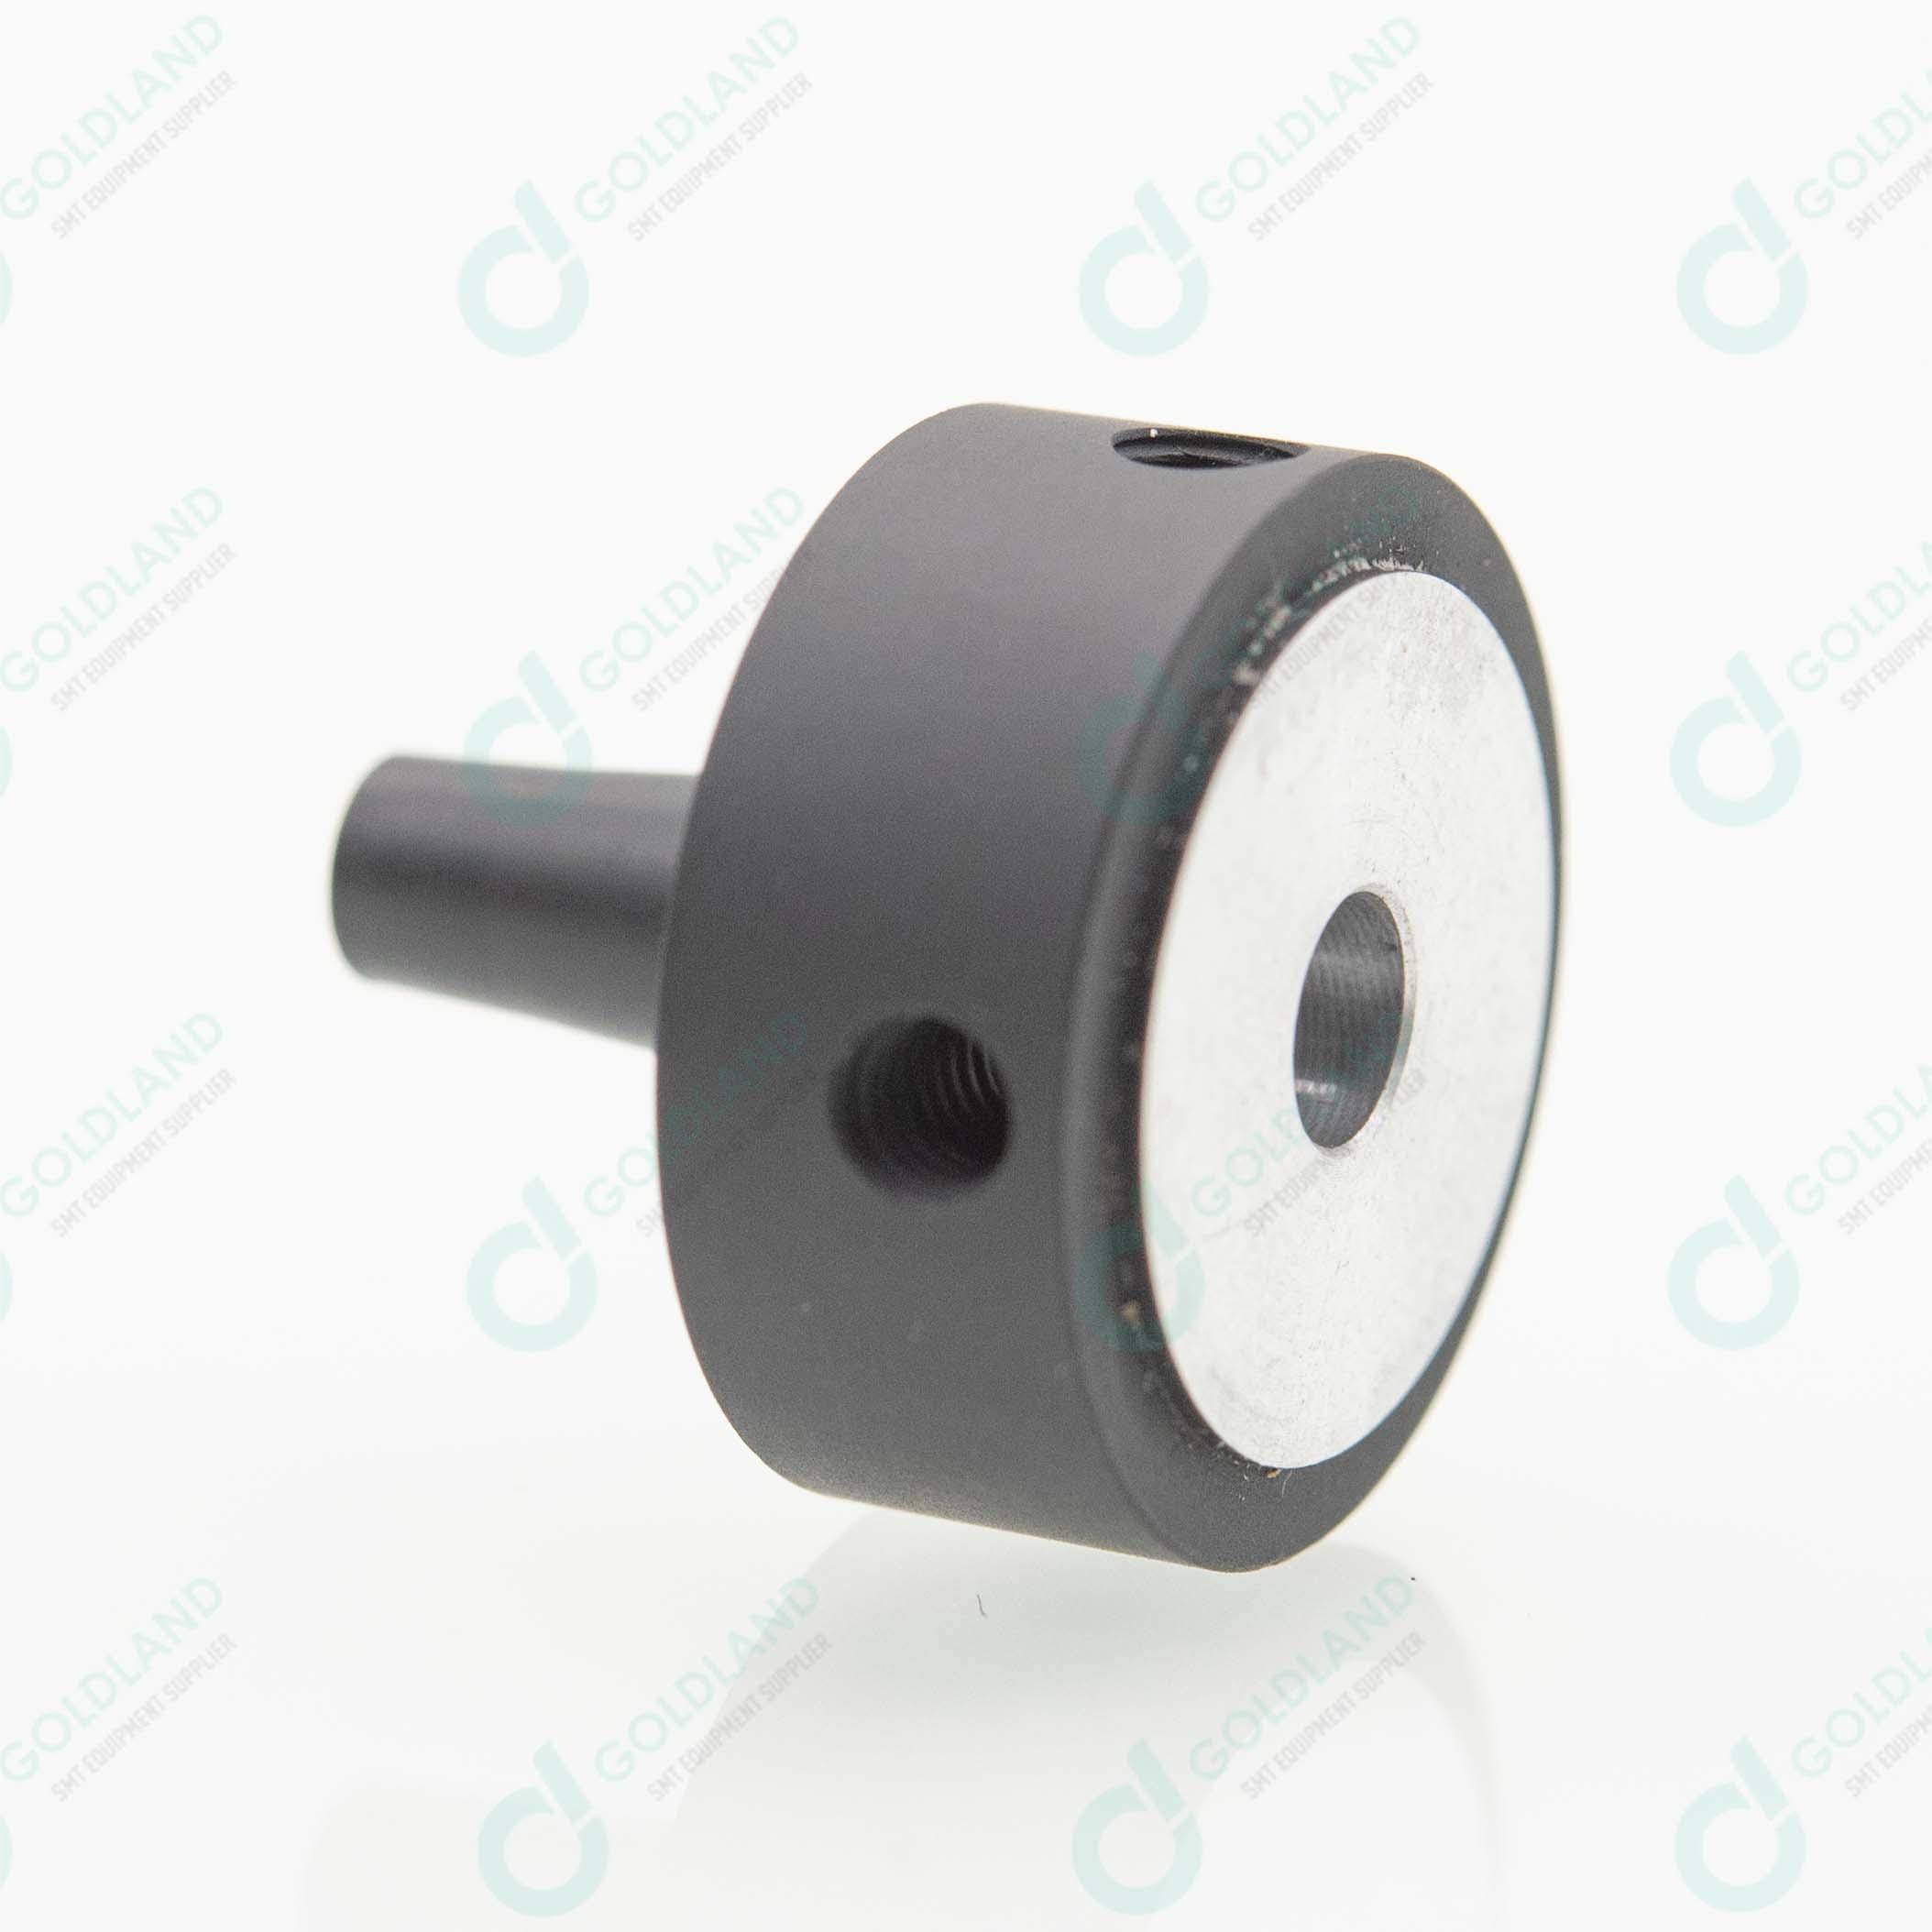 FUJI SMT chip place machine parts 3.7mm FUJI XPF  Nozzle